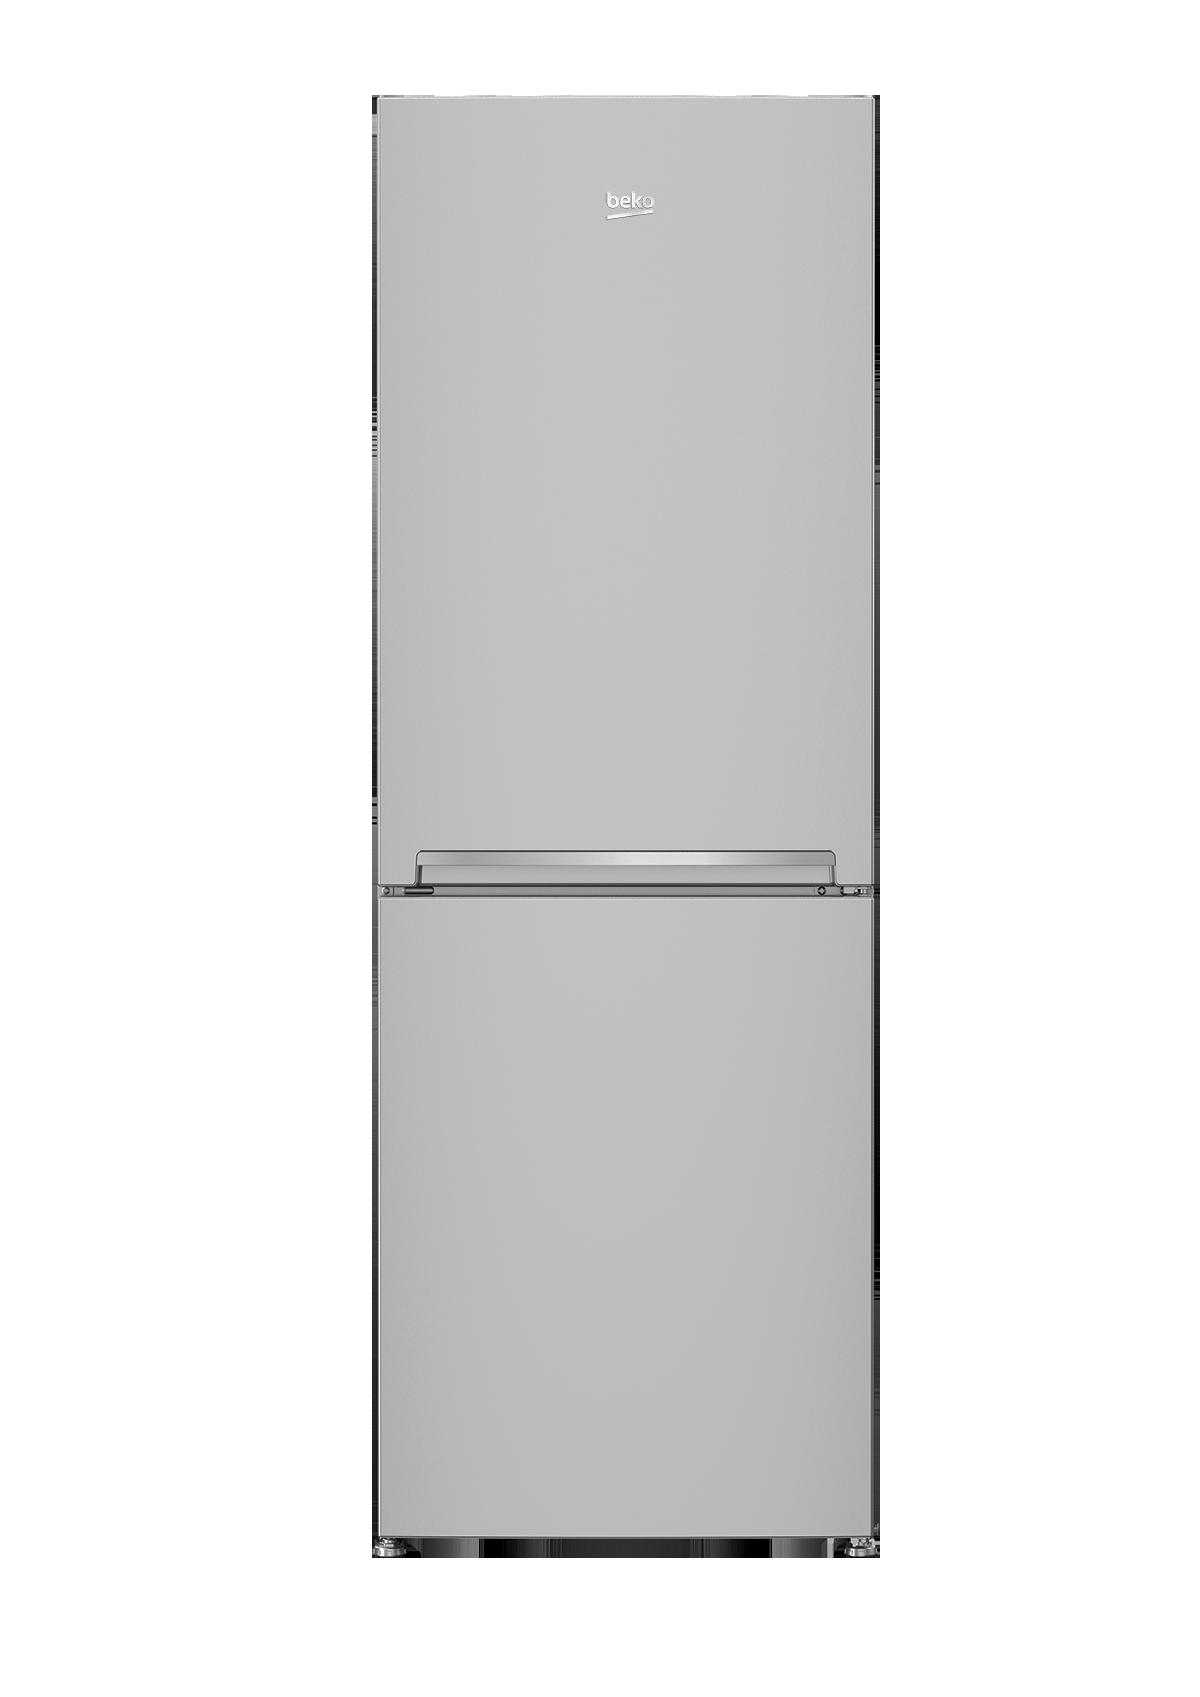 24 Inch Bottom Freezer Silver Refrigerator - BFBF2412SL | BEKO